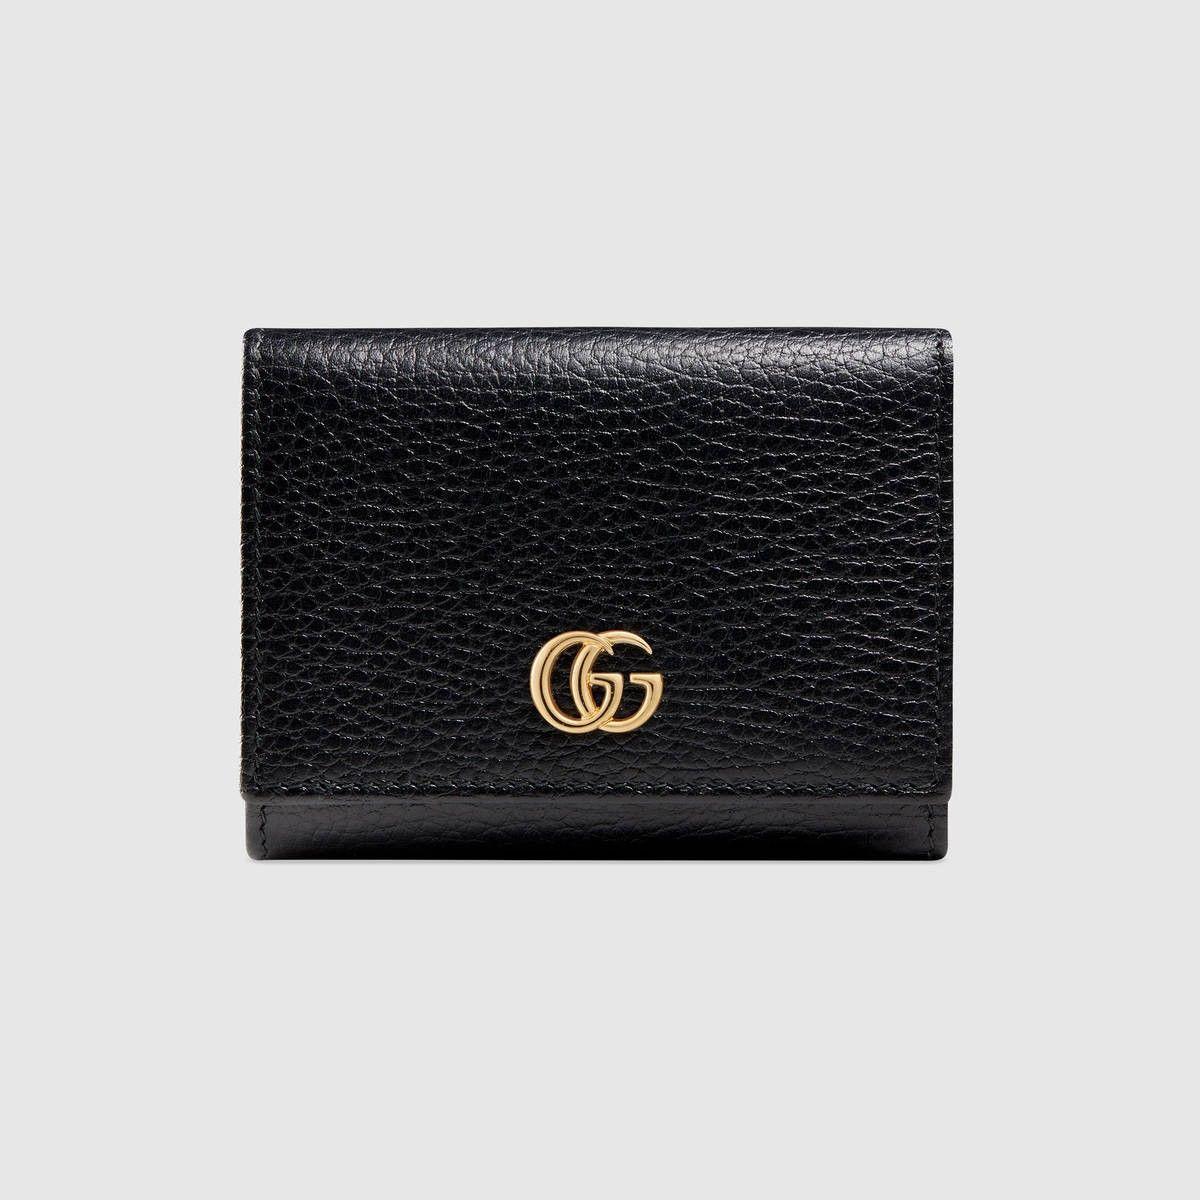 3dc251e6ed53 GUCCI Gg Marmont Leather Wallet - Black Leather. #gucci #all | Gucci